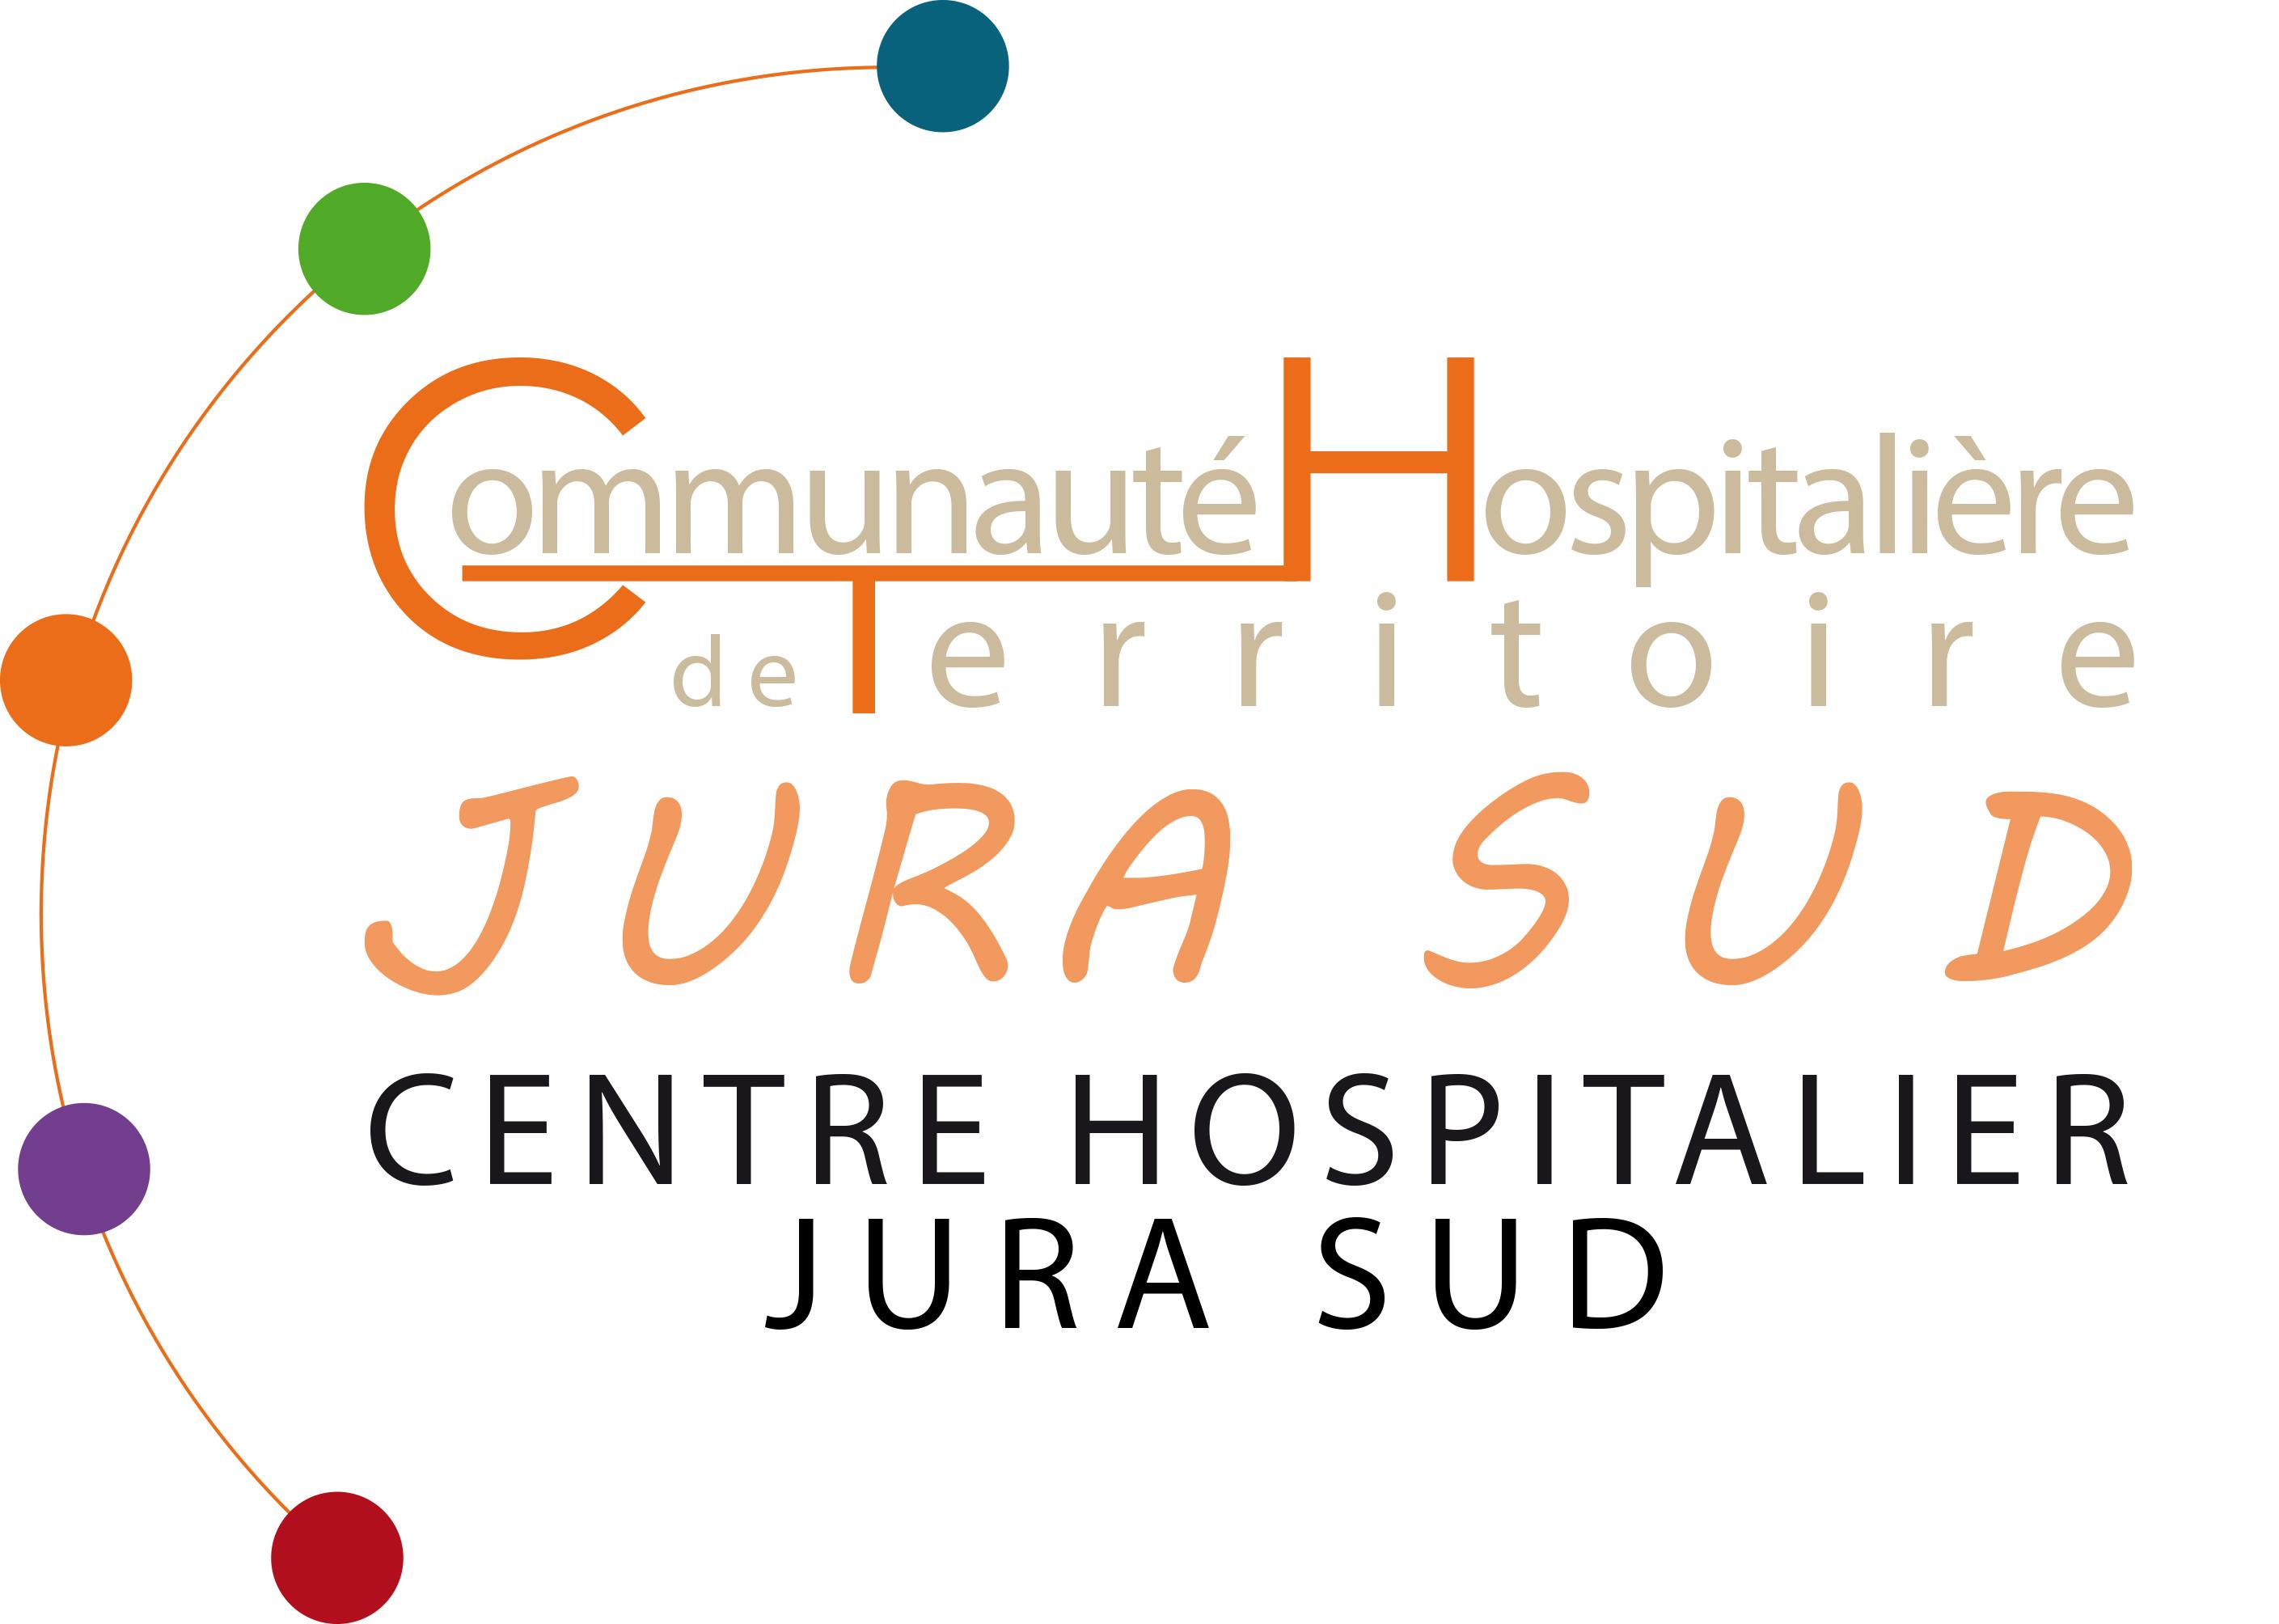 offres d u0026 39 emploi centre hospitalier jura sud  lons